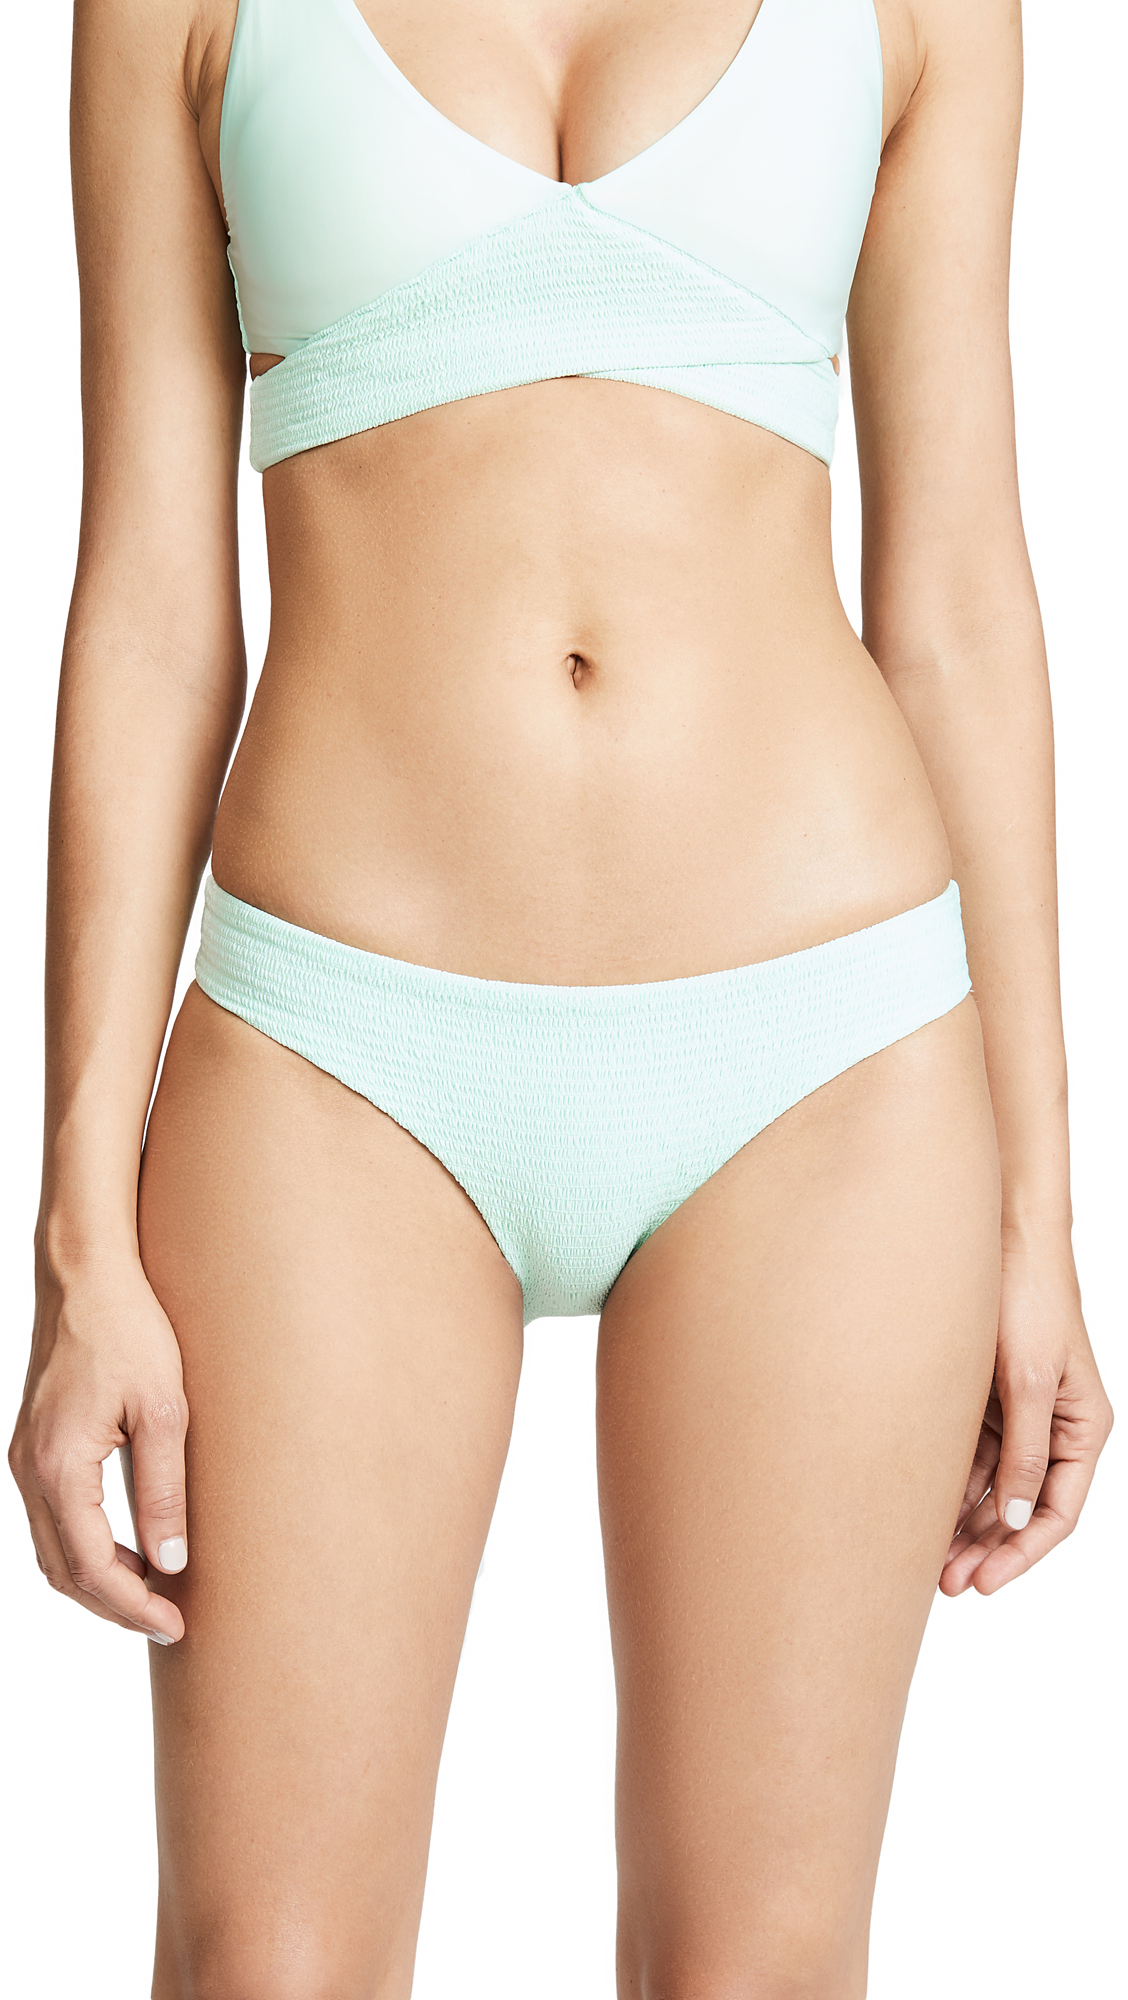 PILYQ Azura Smocked Bikini Bottoms in Mint Green